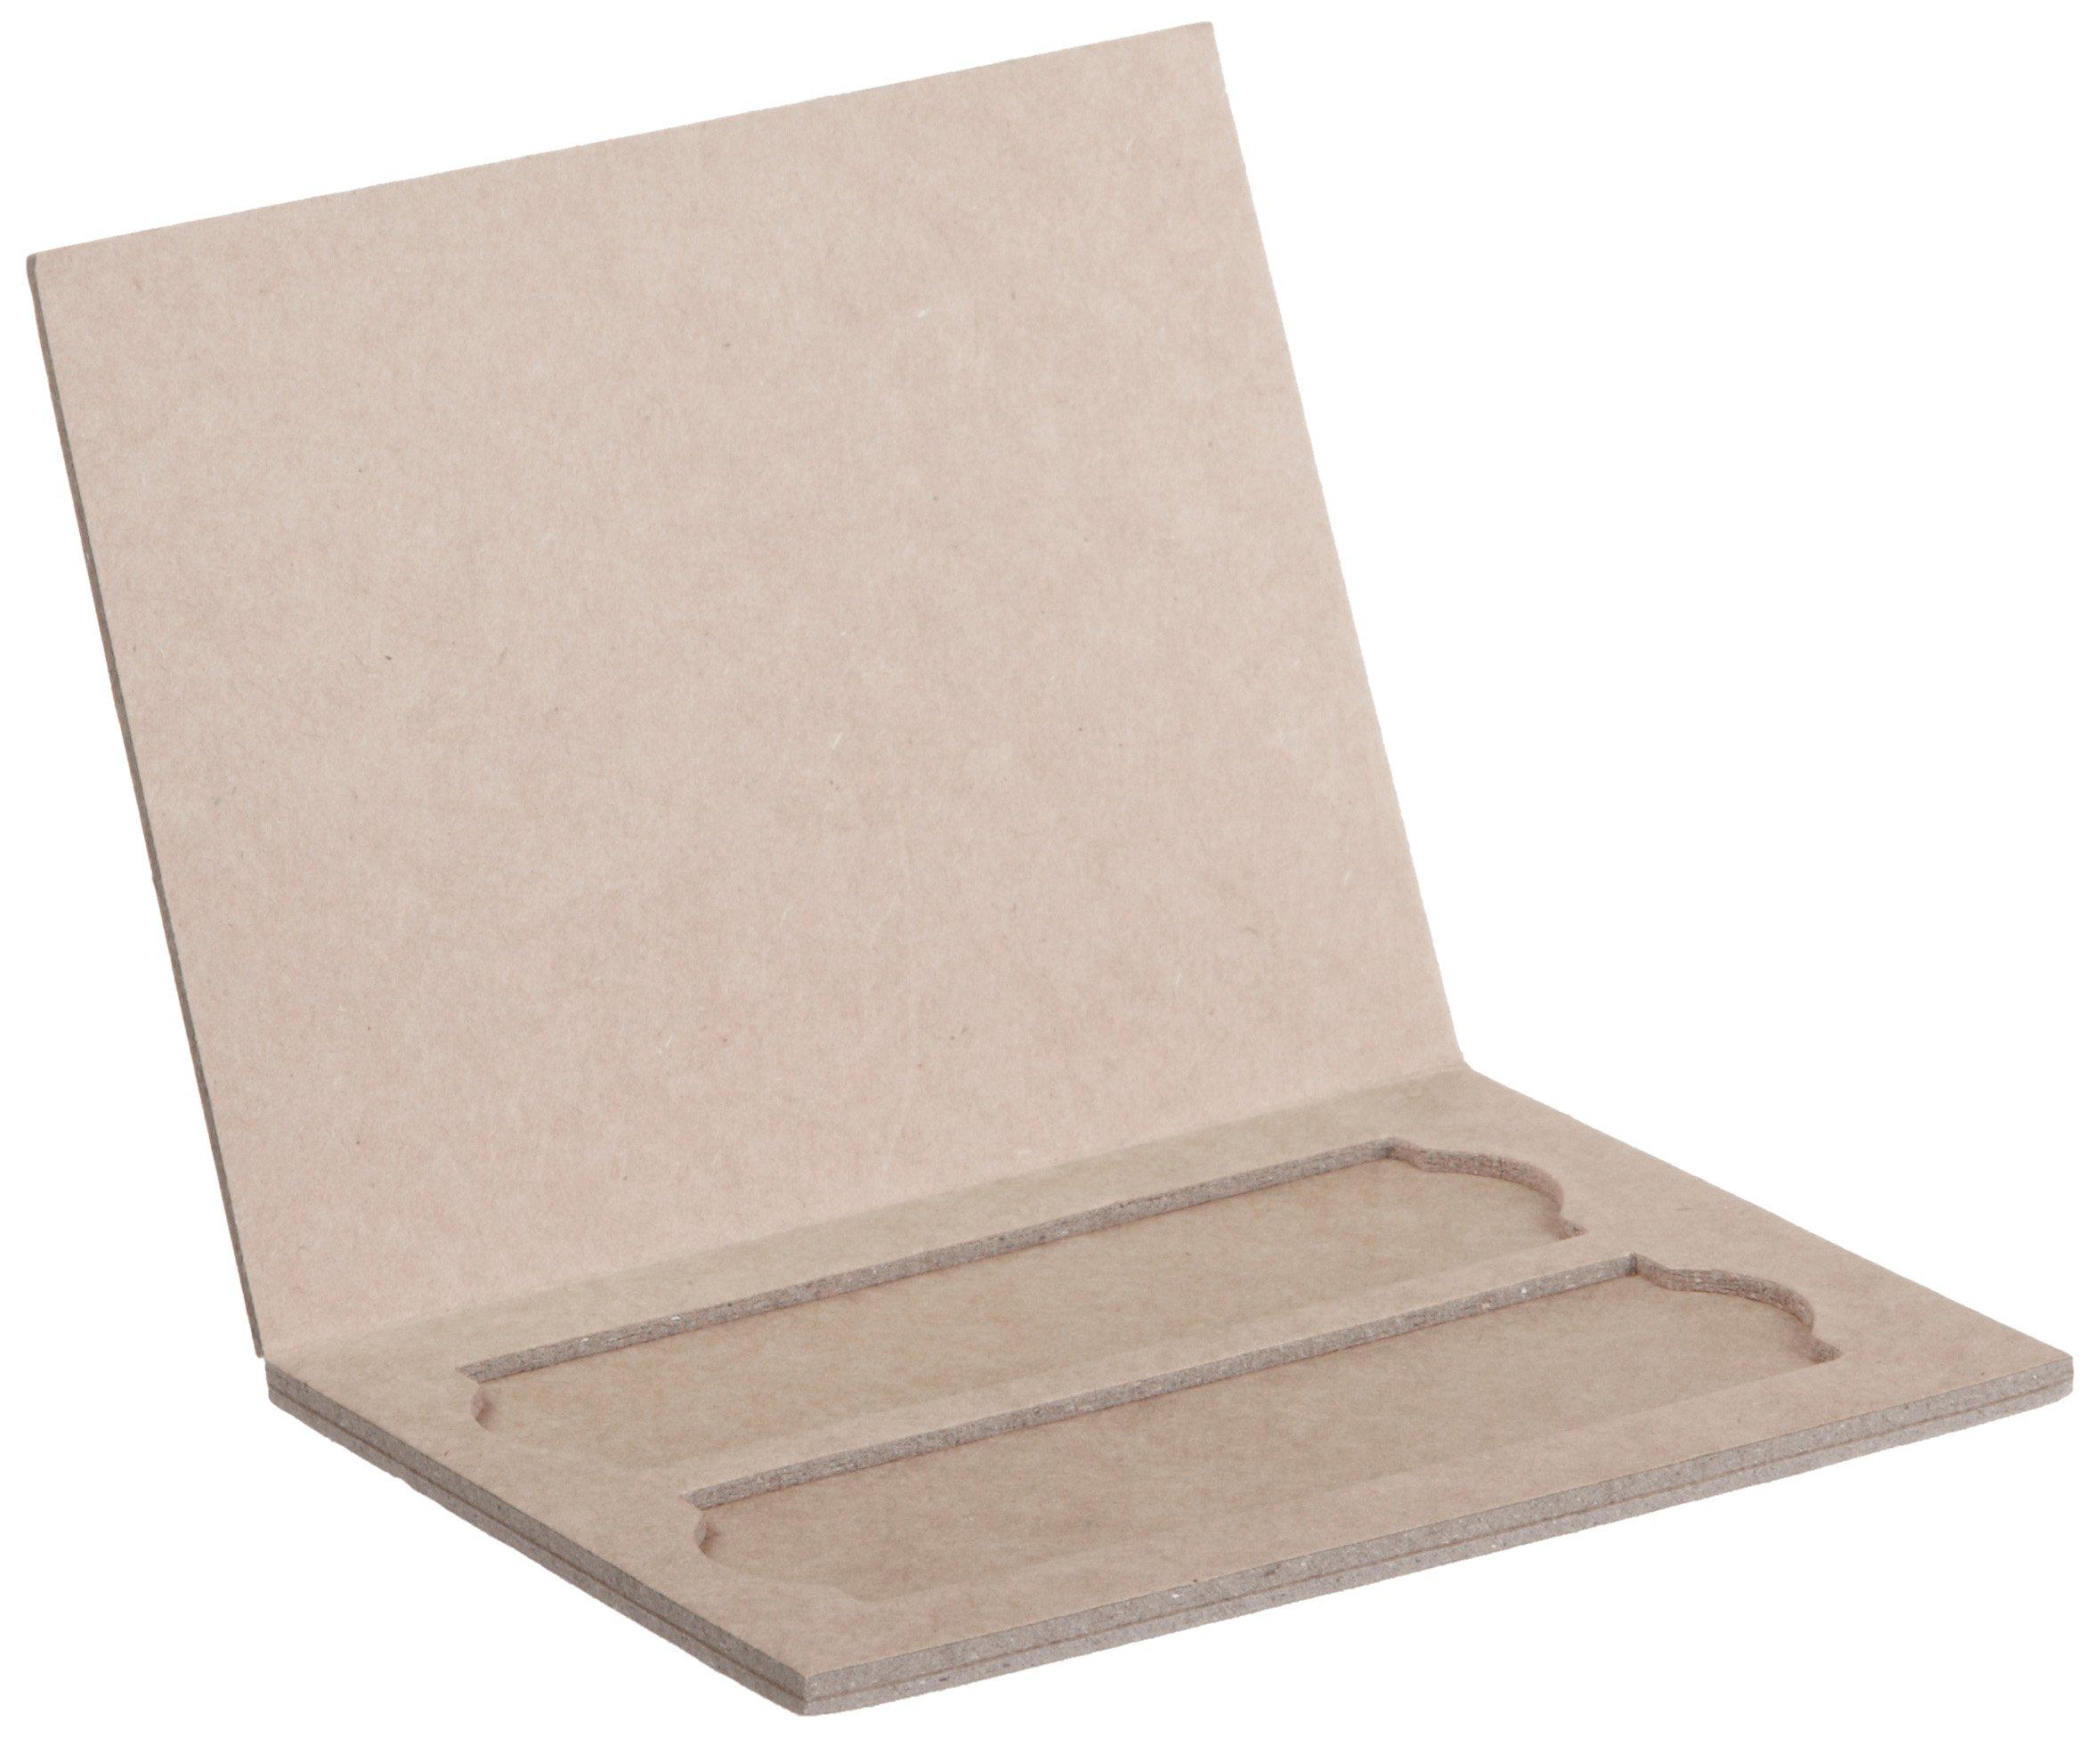 208mm Length X 341mm Width X 9mm Height 20 Place Pack of 72 Heathrow Scientific HD9913 Cardboard Blue Trim Slide Tray